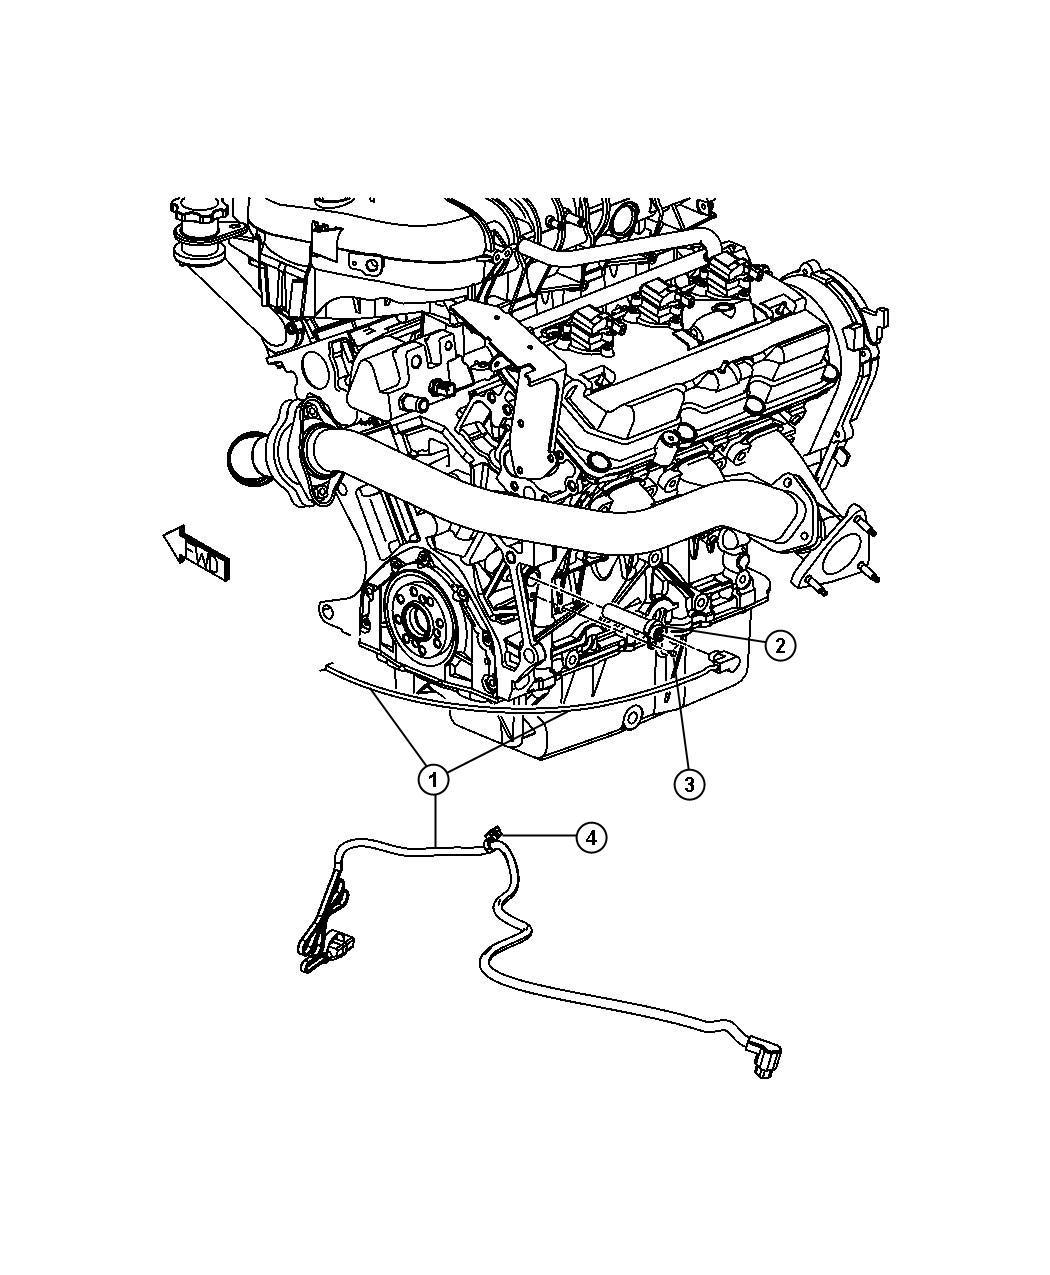 Dodge Grand Caravan Cord. Engine block heater. 3.5l